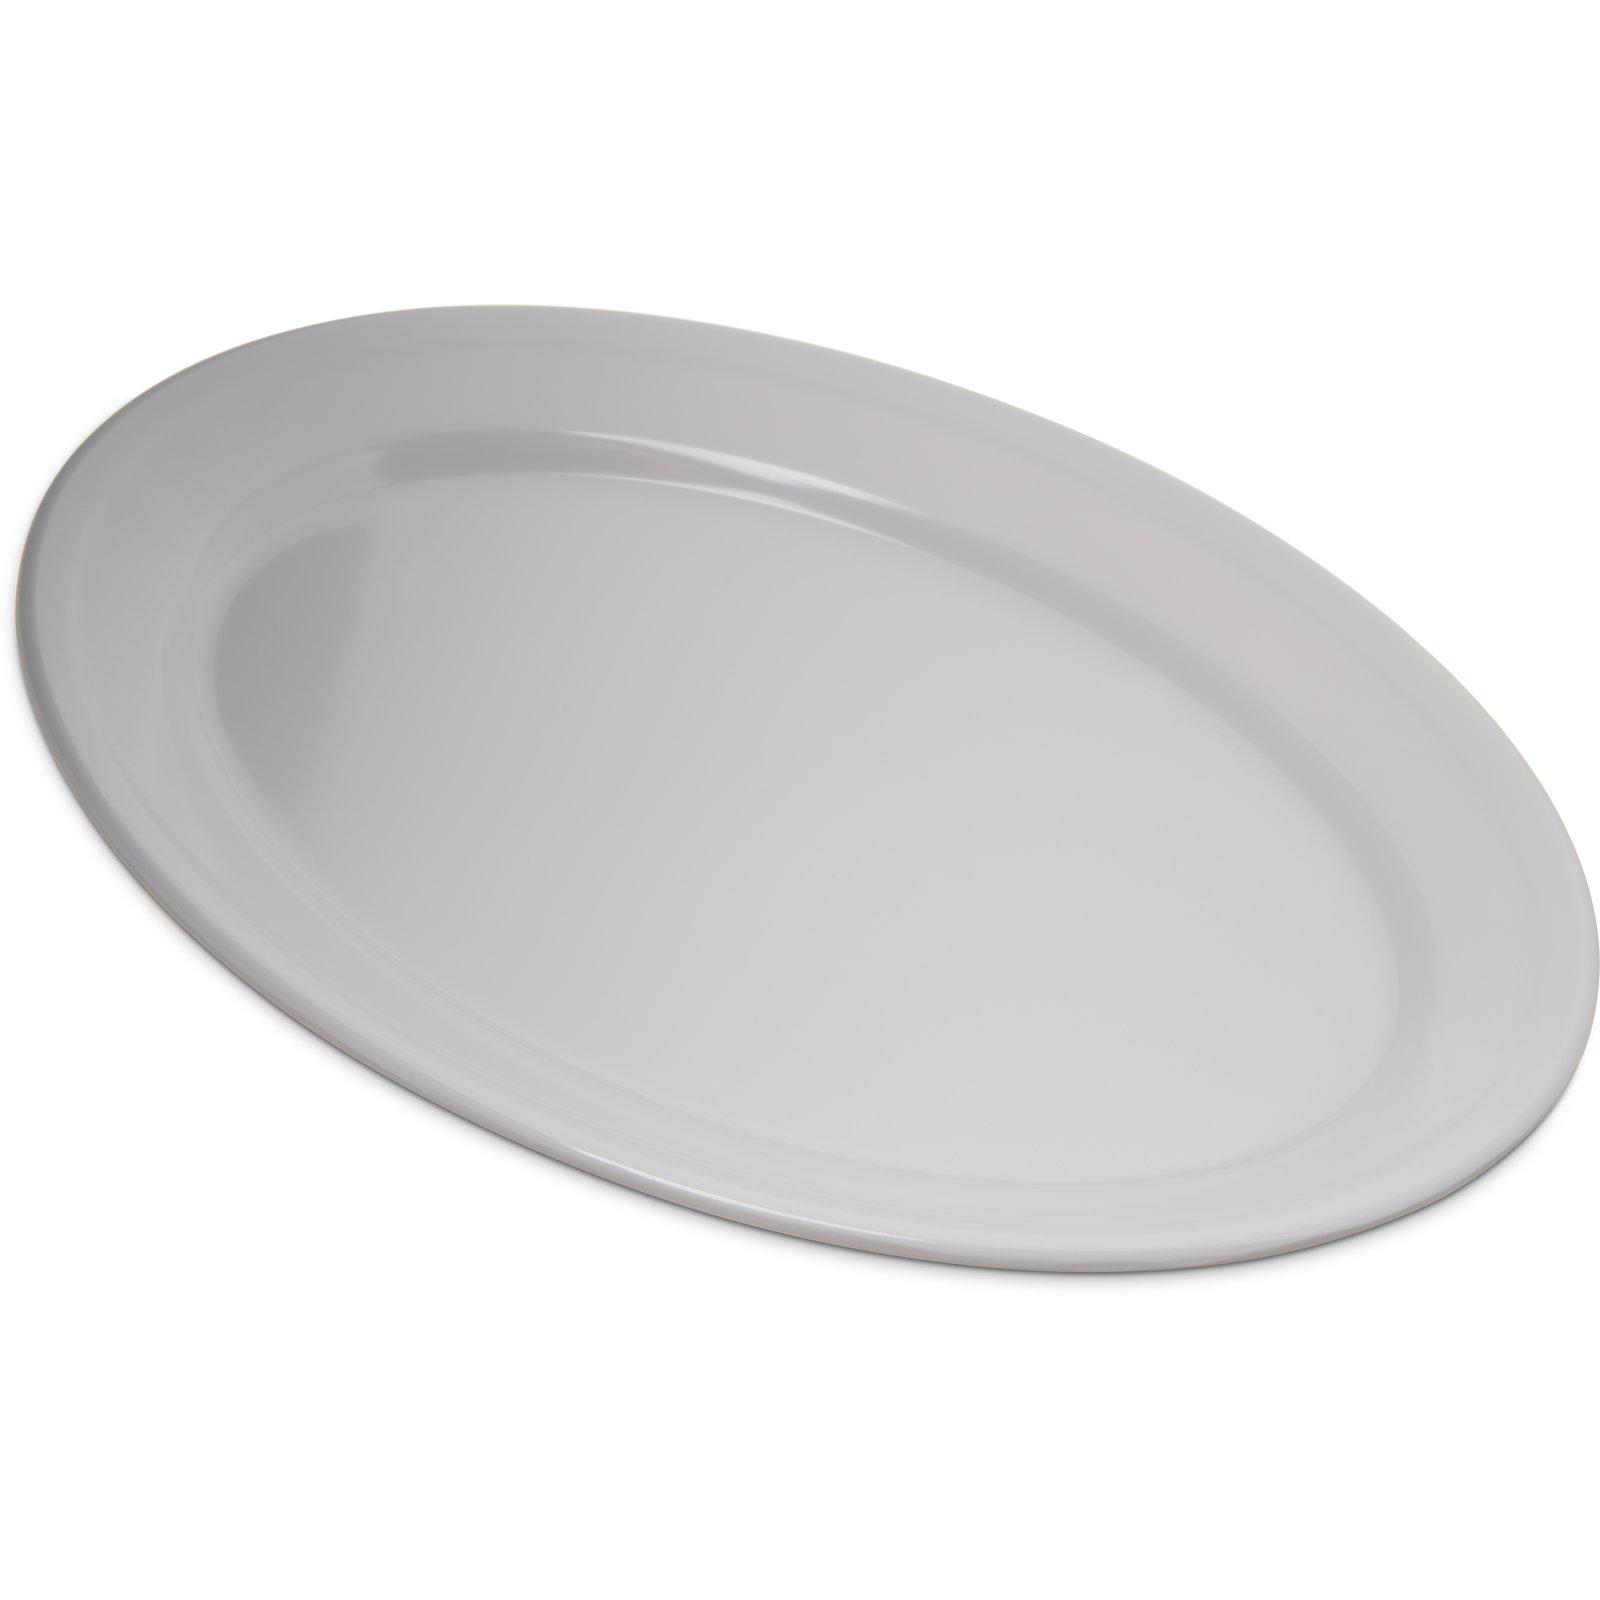 4356002 - Dallas Ware® Melamine Oval Platter Tray 12  x 8.5  - White  sc 1 st  Carlisle FoodService Products & 4356002 - Dallas Ware® Melamine Oval Platter Tray 12